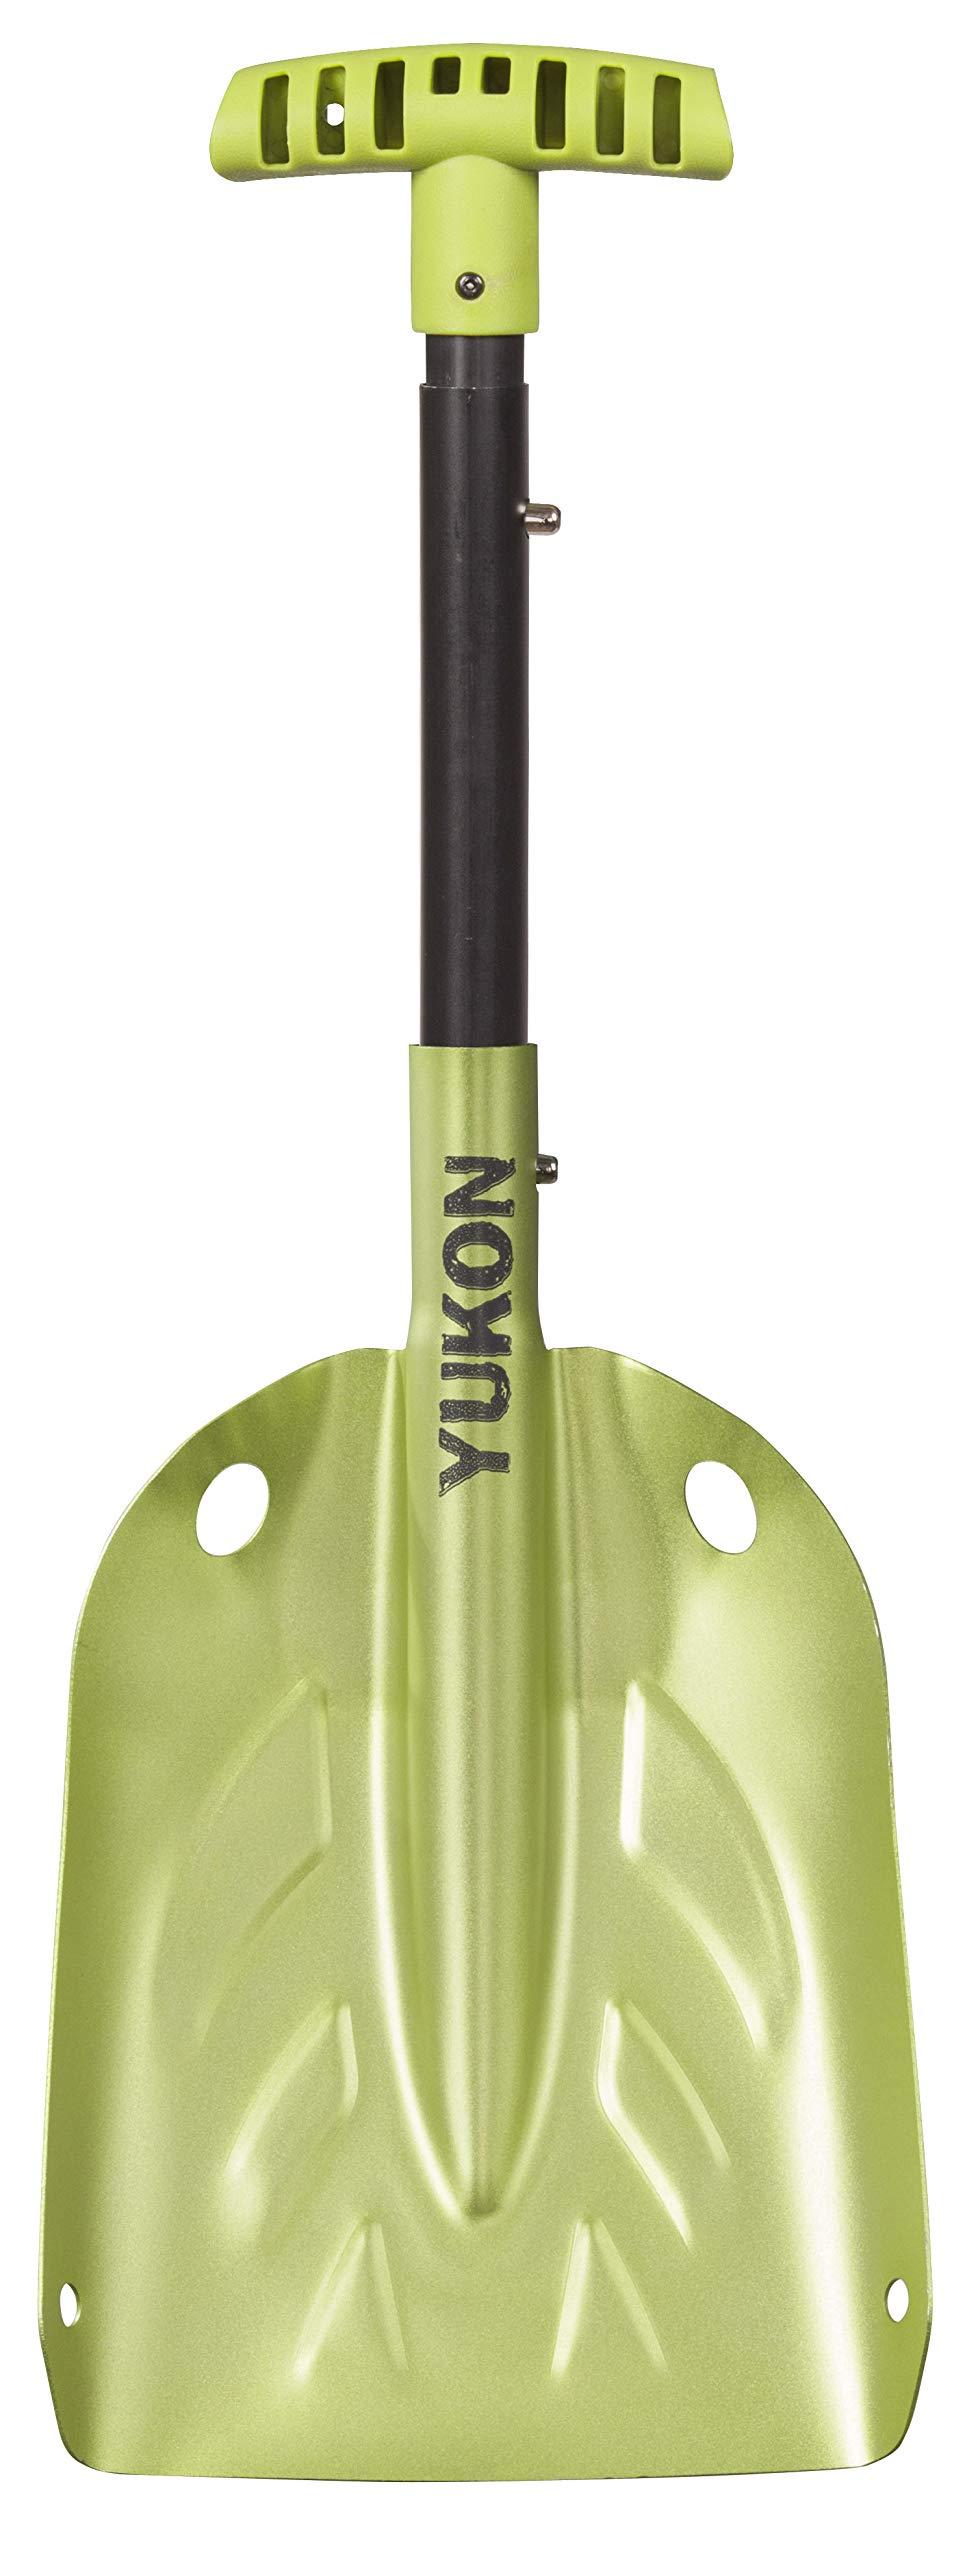 YUKON Collapsible Shovel Neon